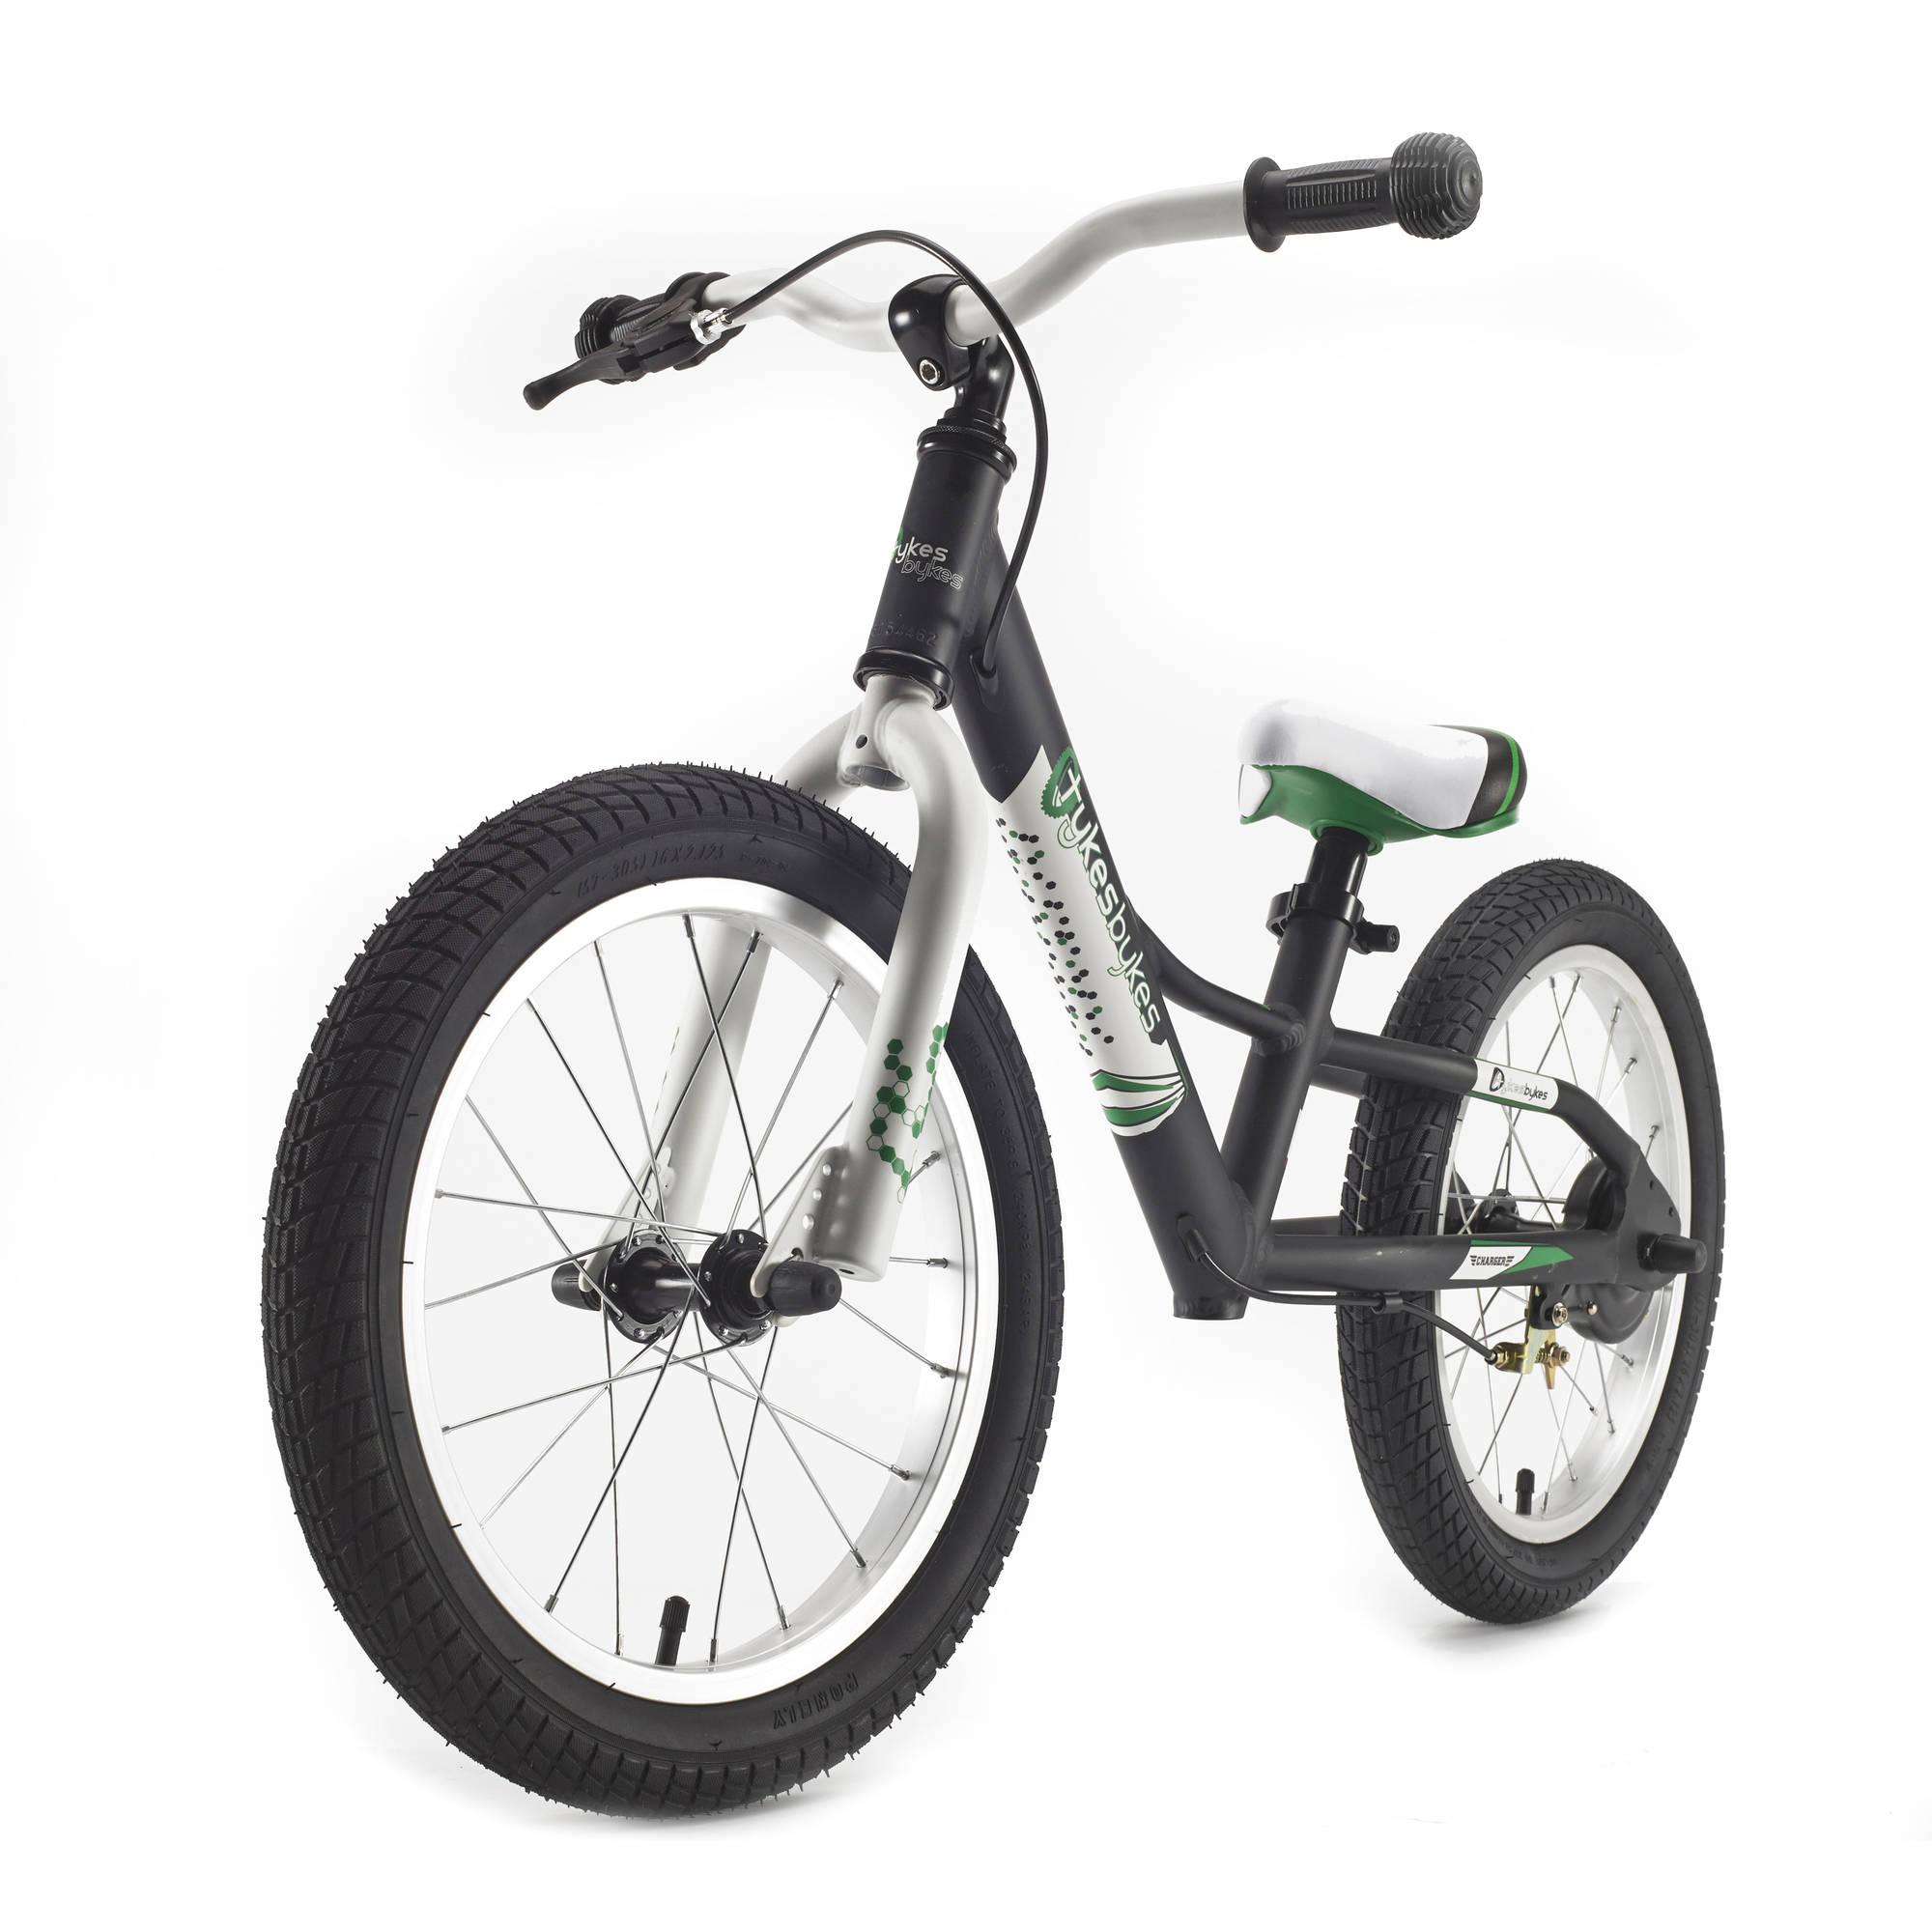 16 Stampede Bikes Charger Balance Bike, Black